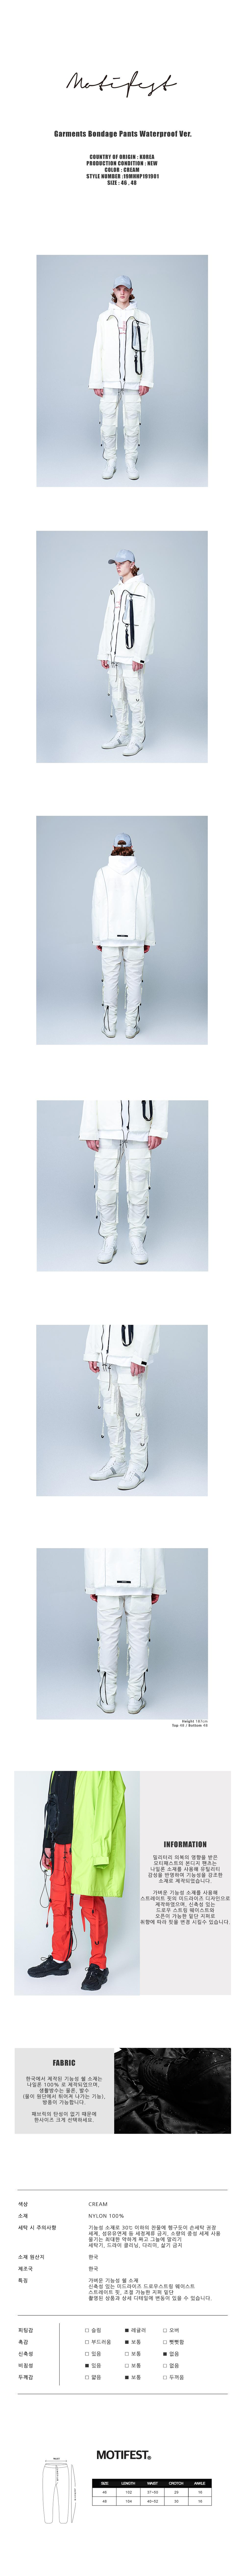 19-SS-Garments-Bondage-Pants-Waterproof-Ver-Cream-D-1000.jpg